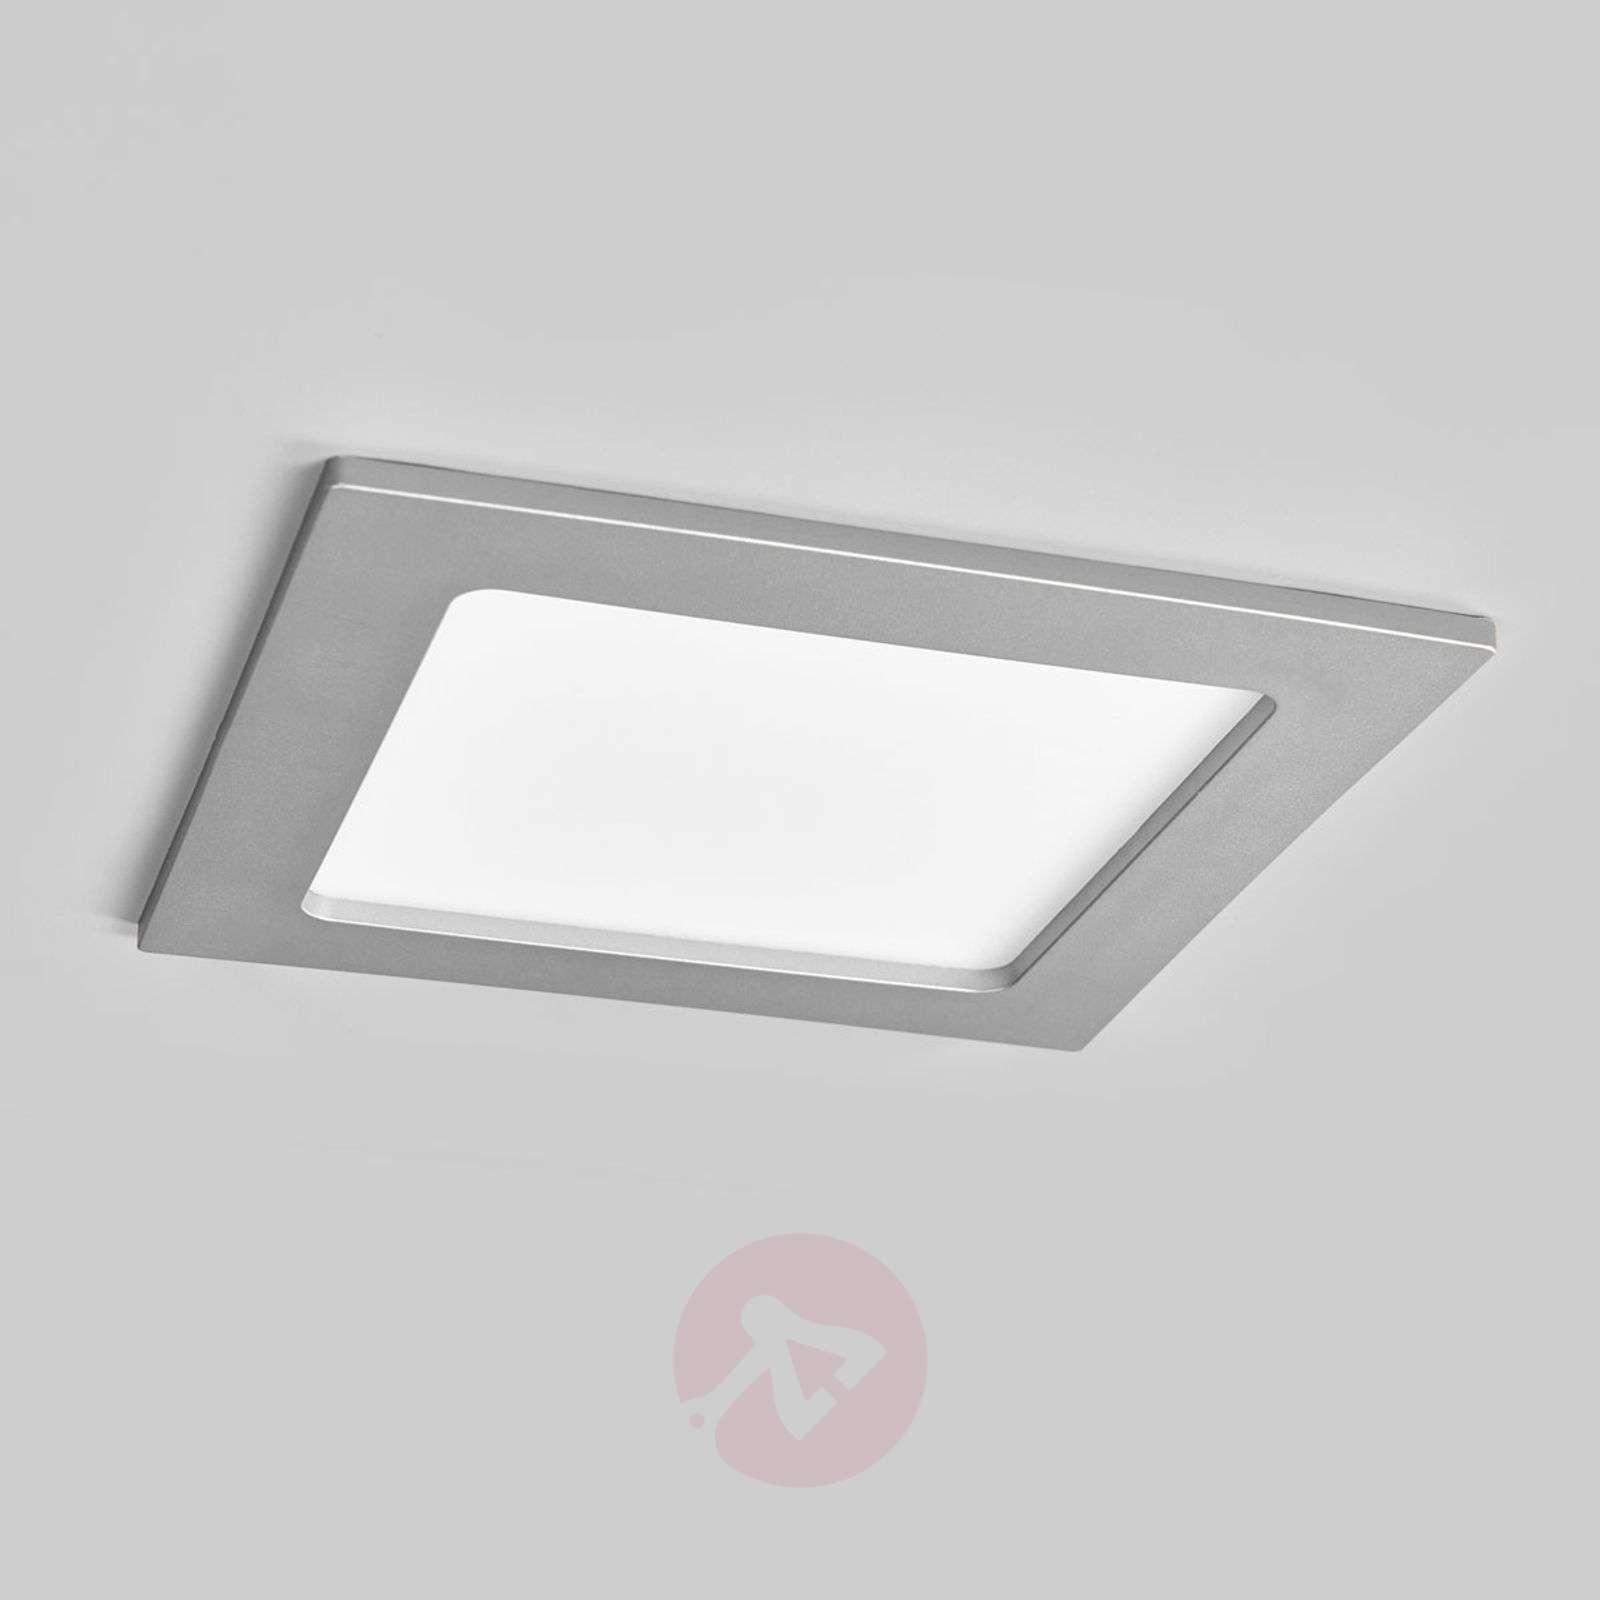 LED-kohdevalo Joki hopea 3000K kulmikas 16,5 cm-9978049-02